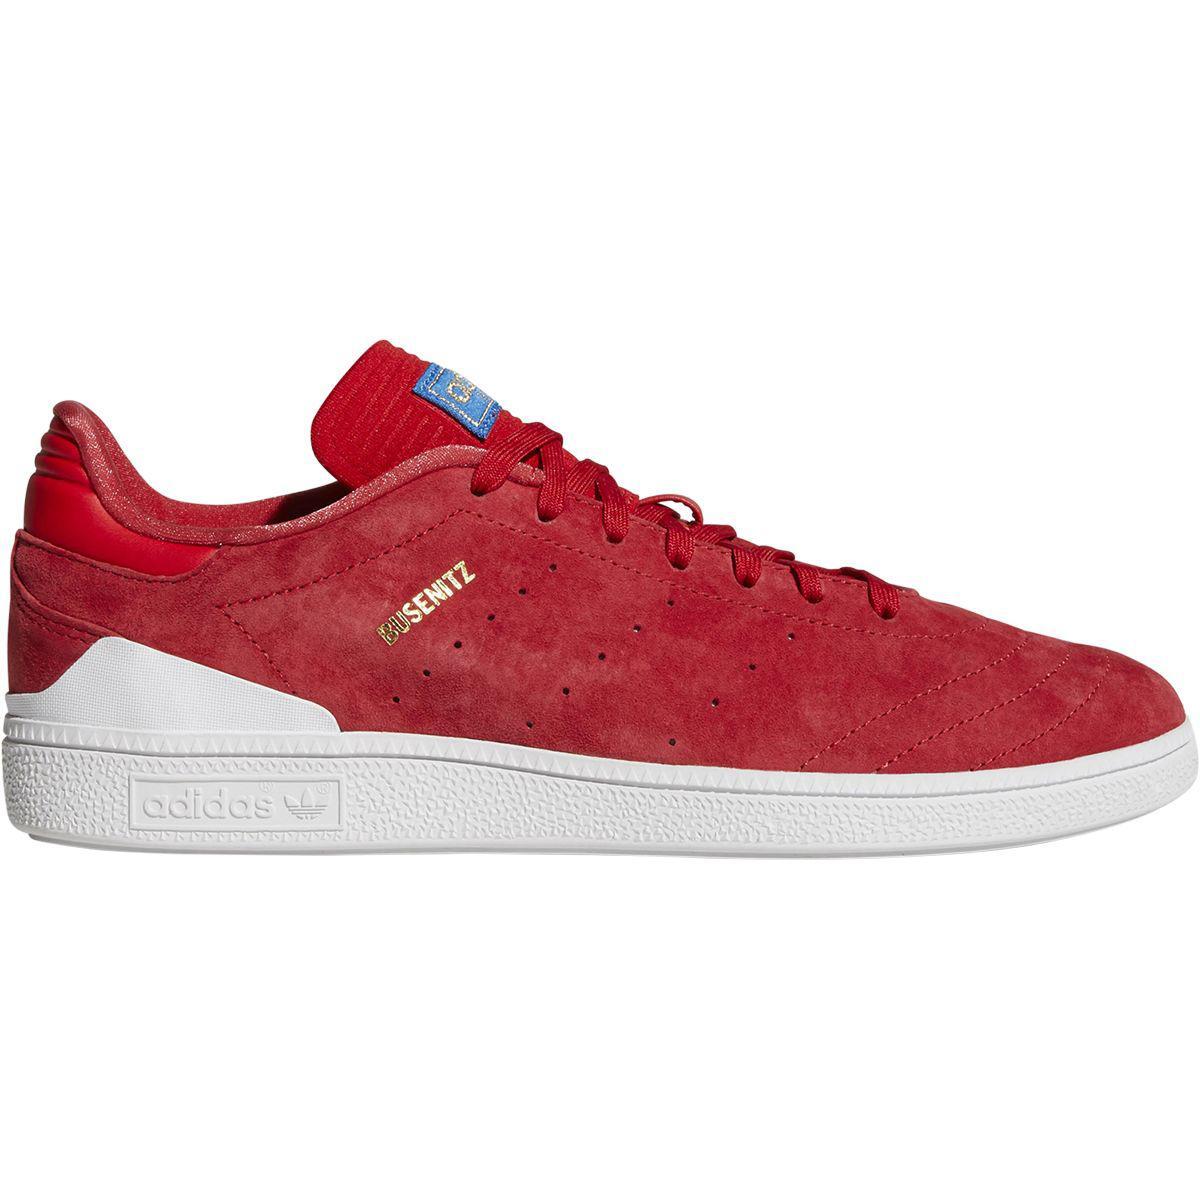 Zapatillas Rx Lyst Adidas Busenitz 10350 Rx Busenitz en rojo para hombre 7c32ede - sfitness.xyz